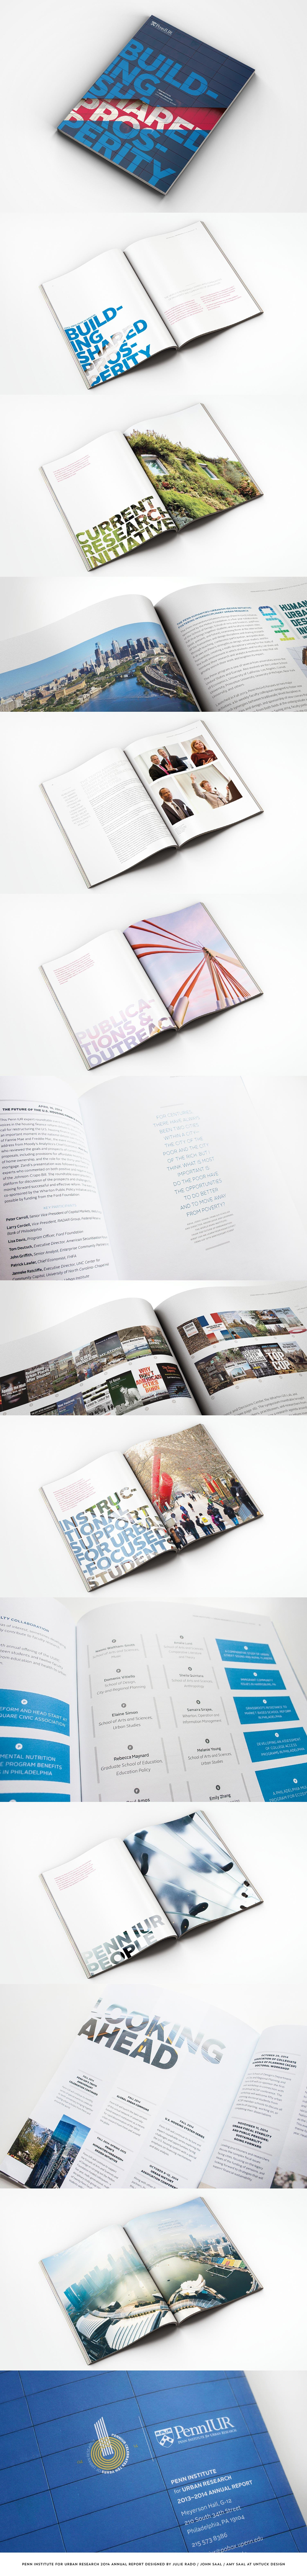 julierado-penn-institute-for-urban-research-2014-annual-report-board.jpg